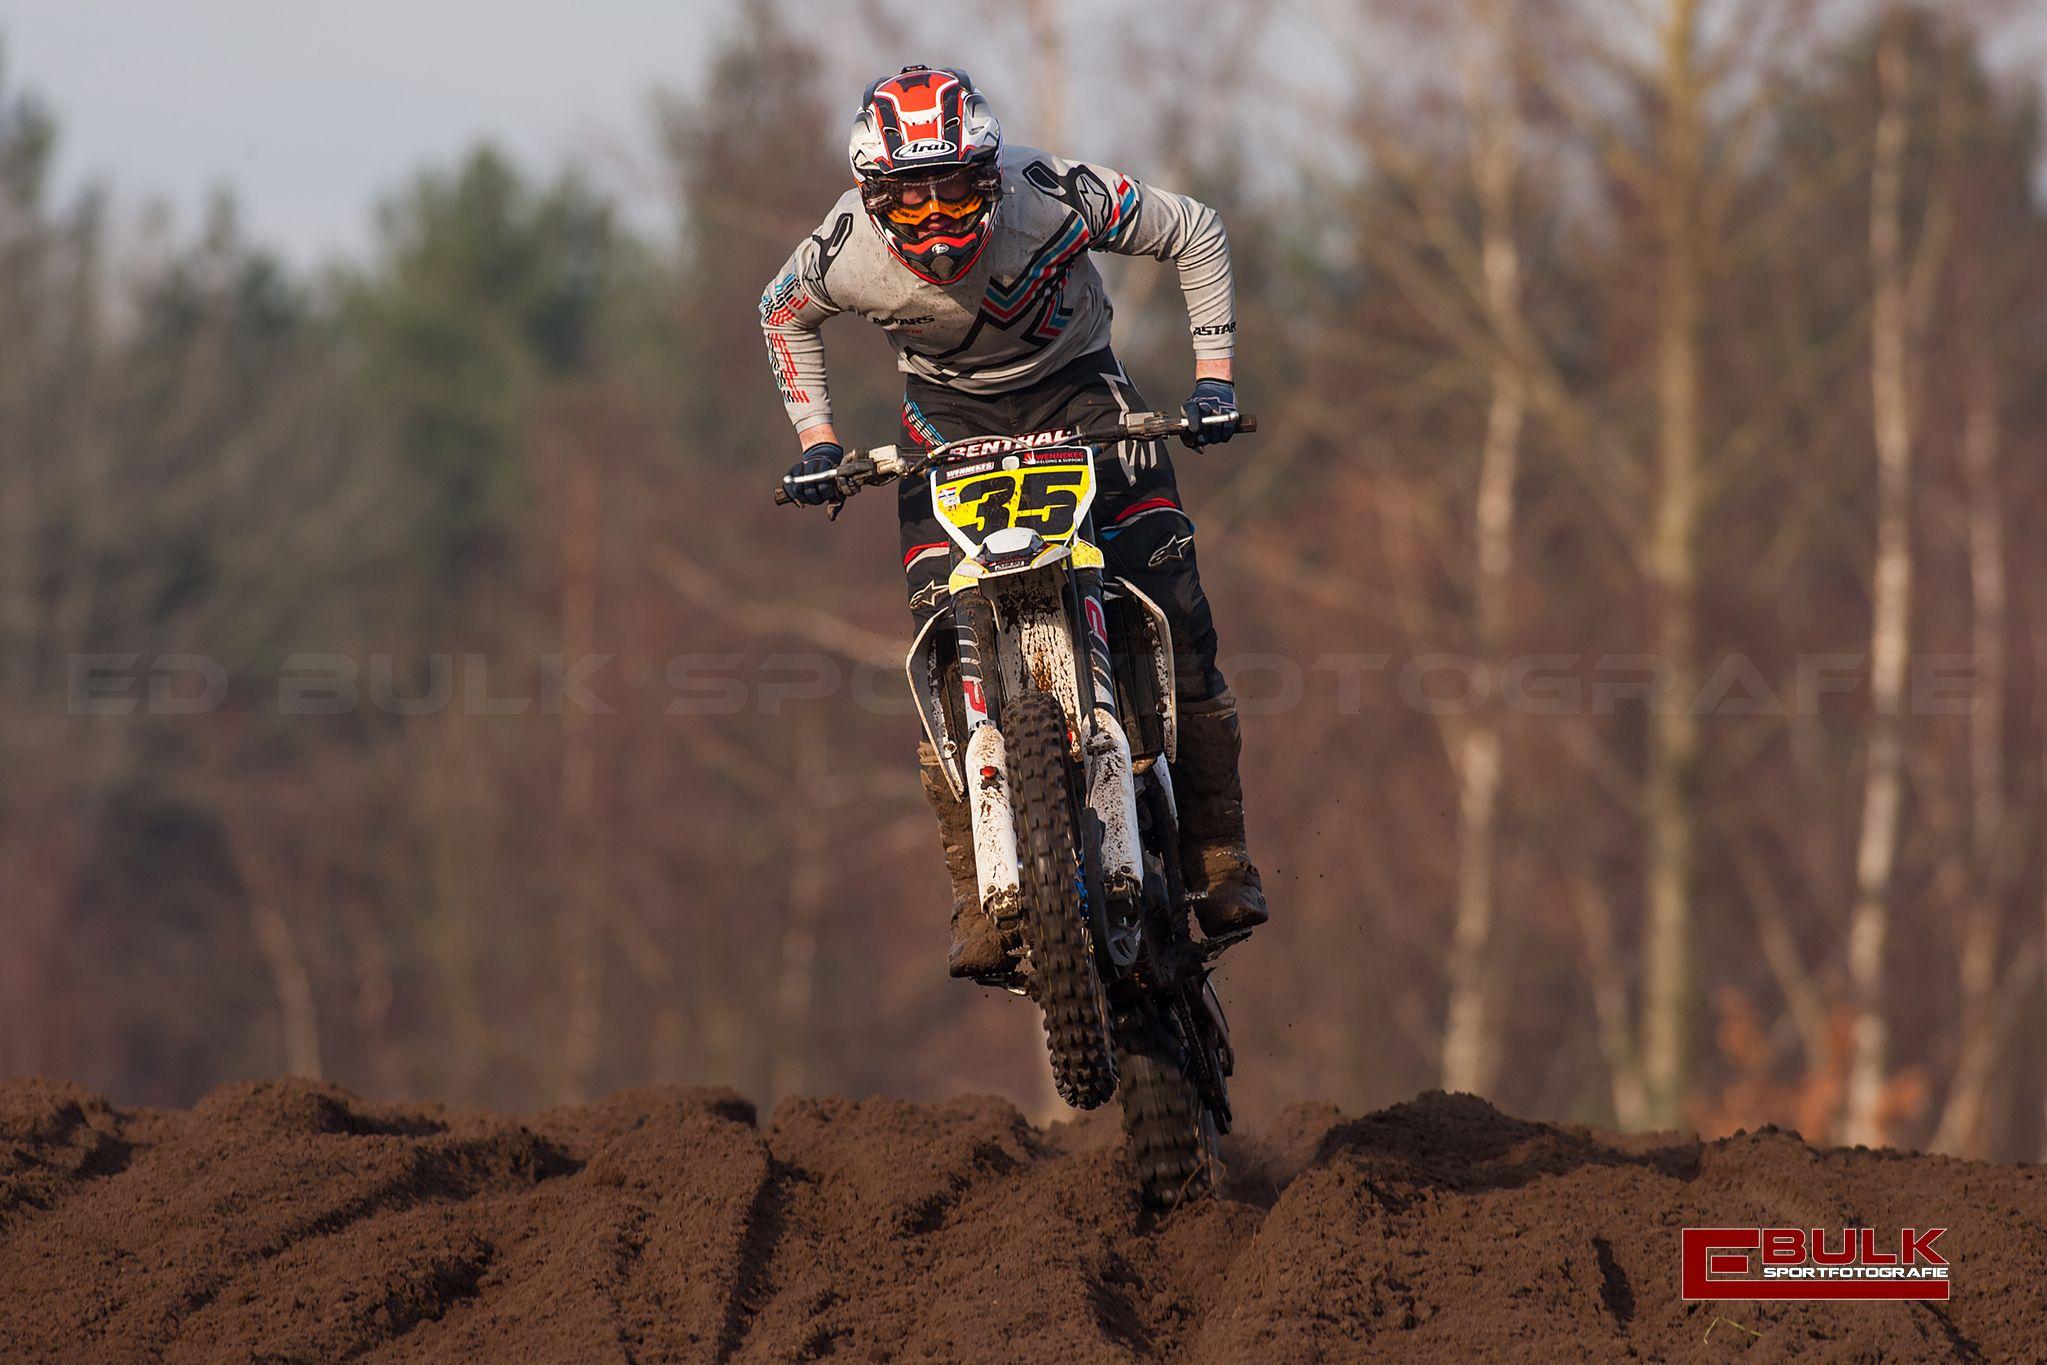 ebs_0487-ed_bulk_sportfotografie